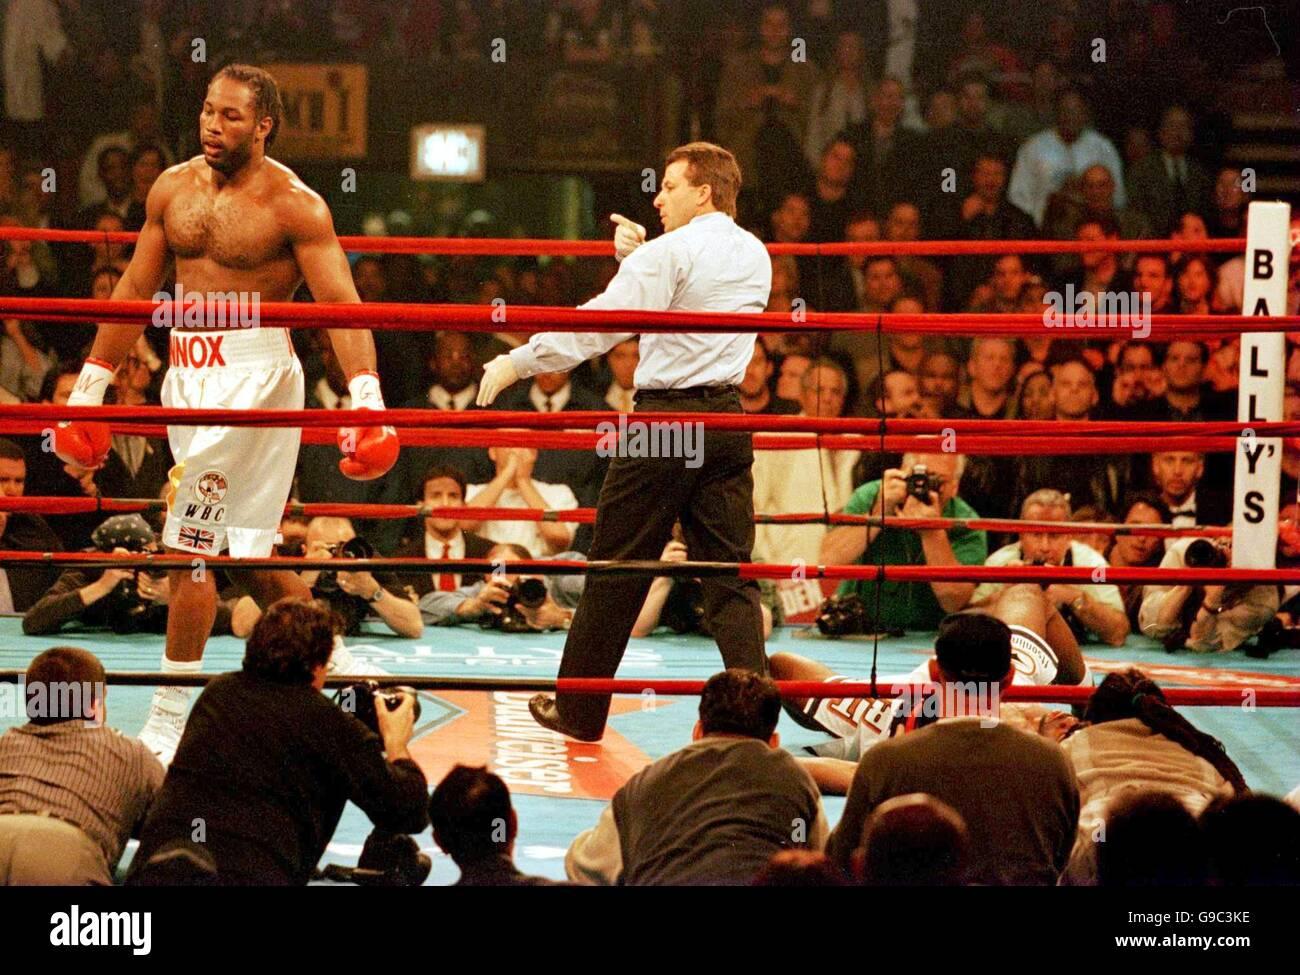 Boxing - WBC Heavyweight Championship - Lennox Lewis v Michael Grant ...